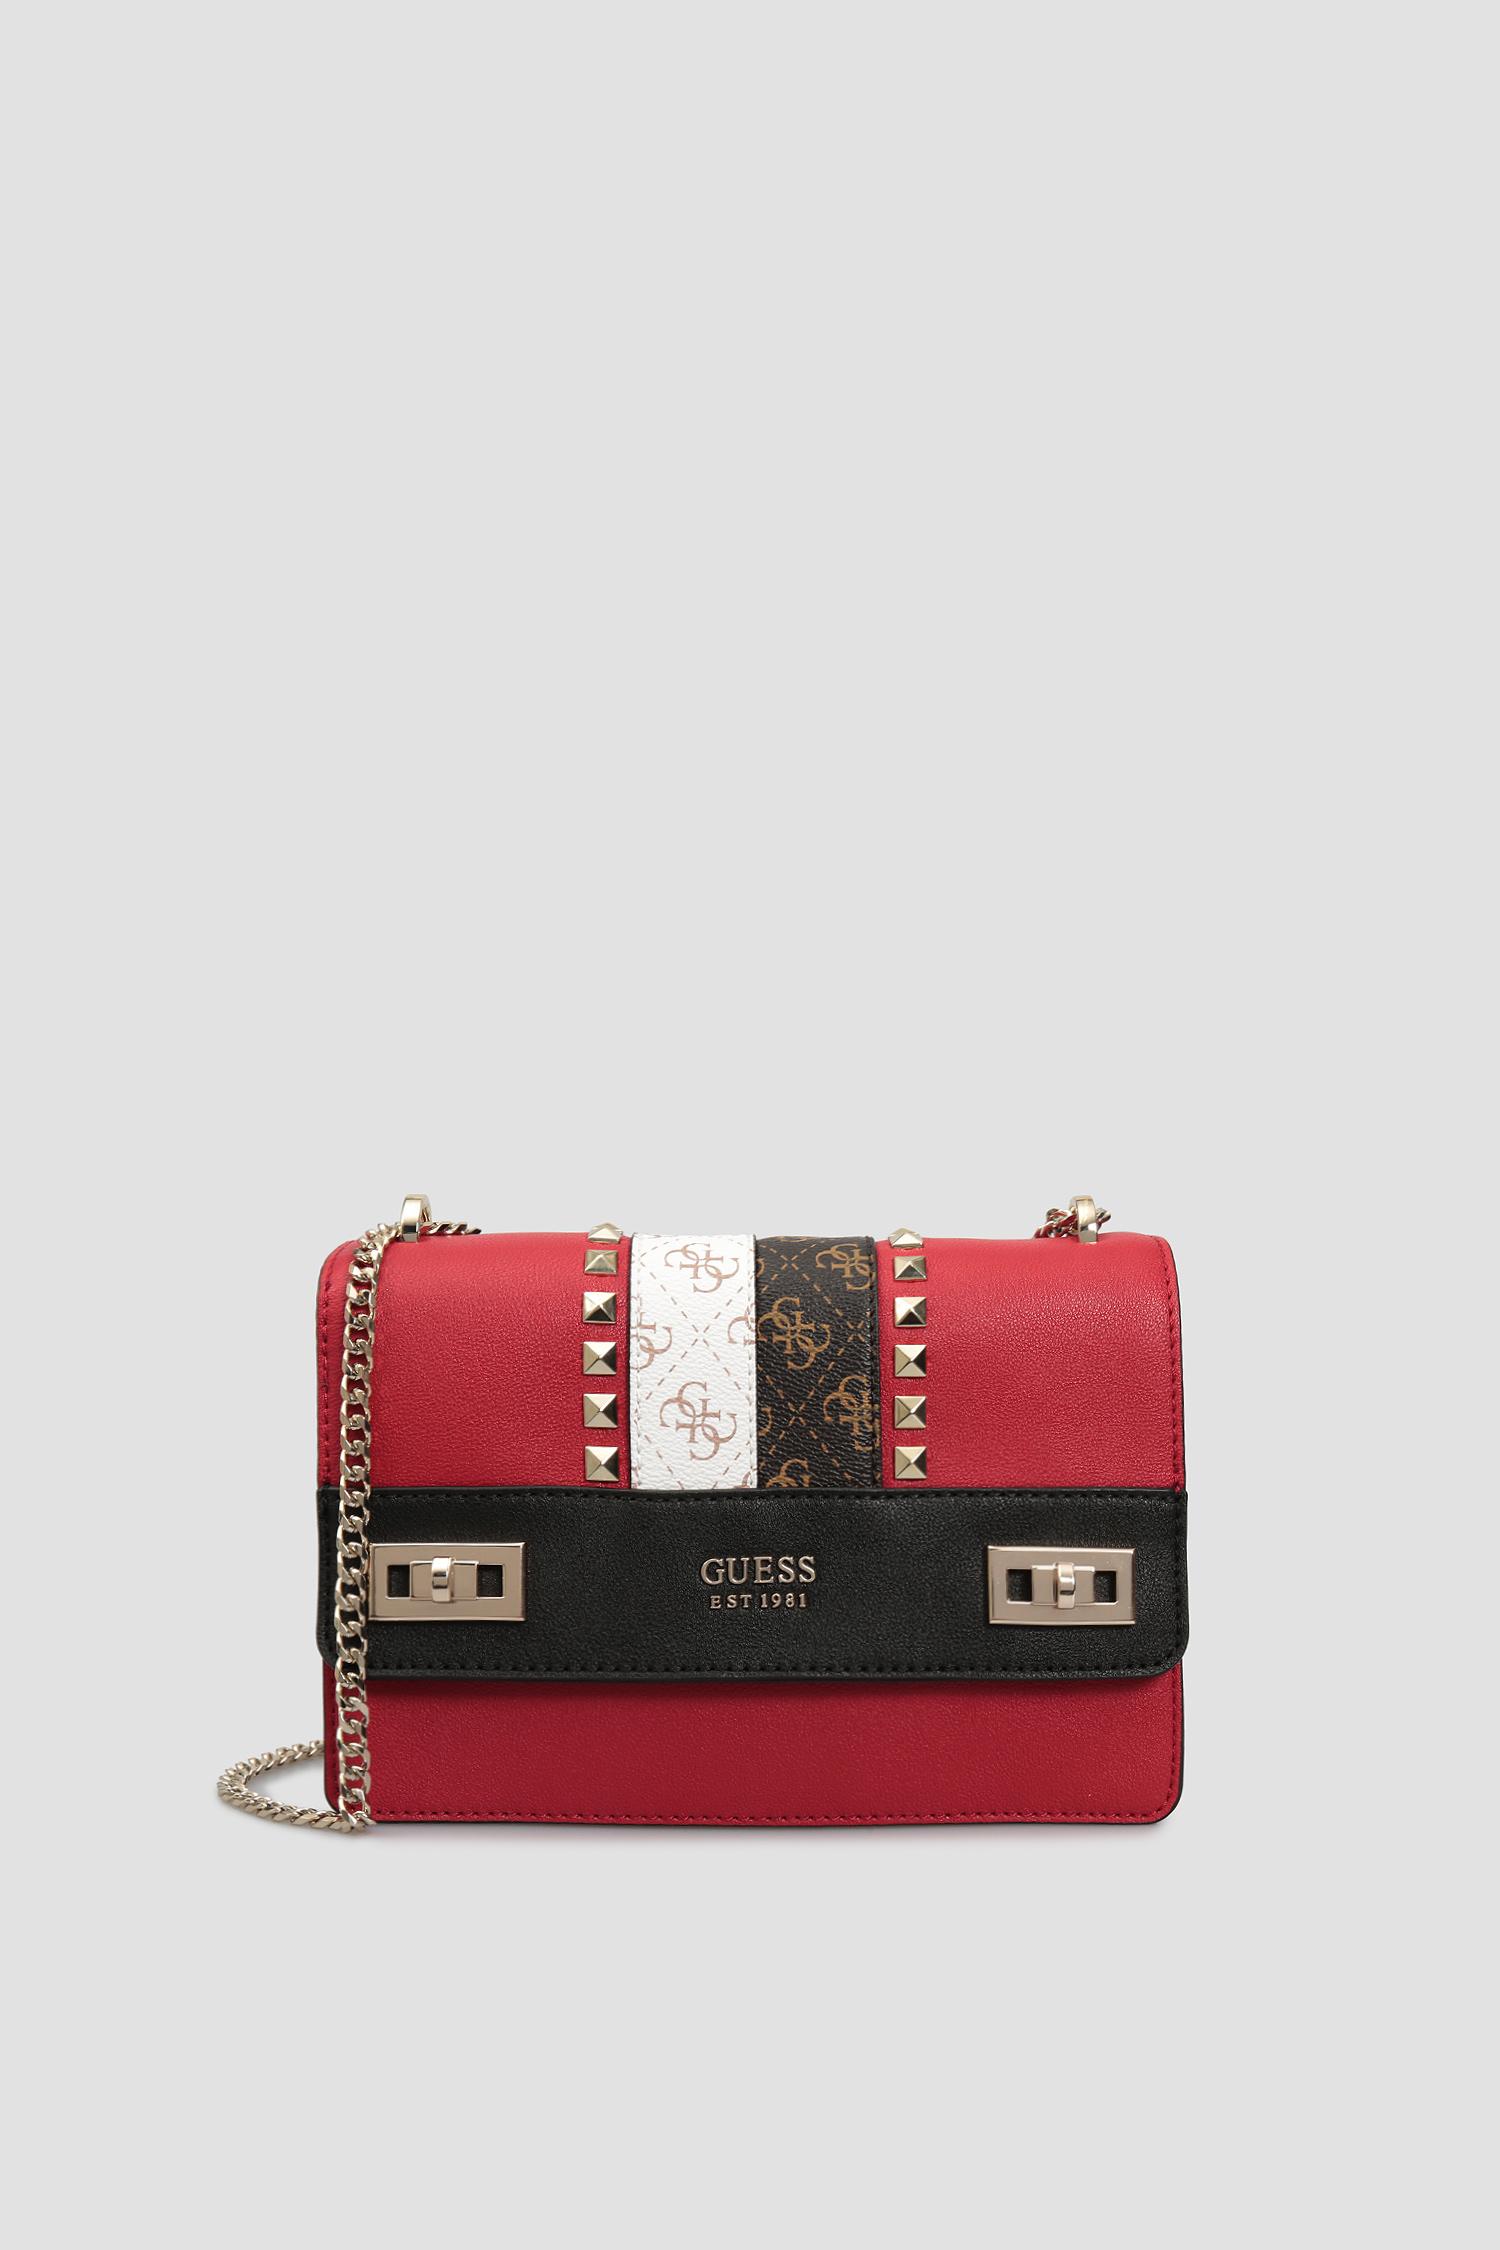 Красная сумка через плечо для девушек Guess HWVS78.70210;RML